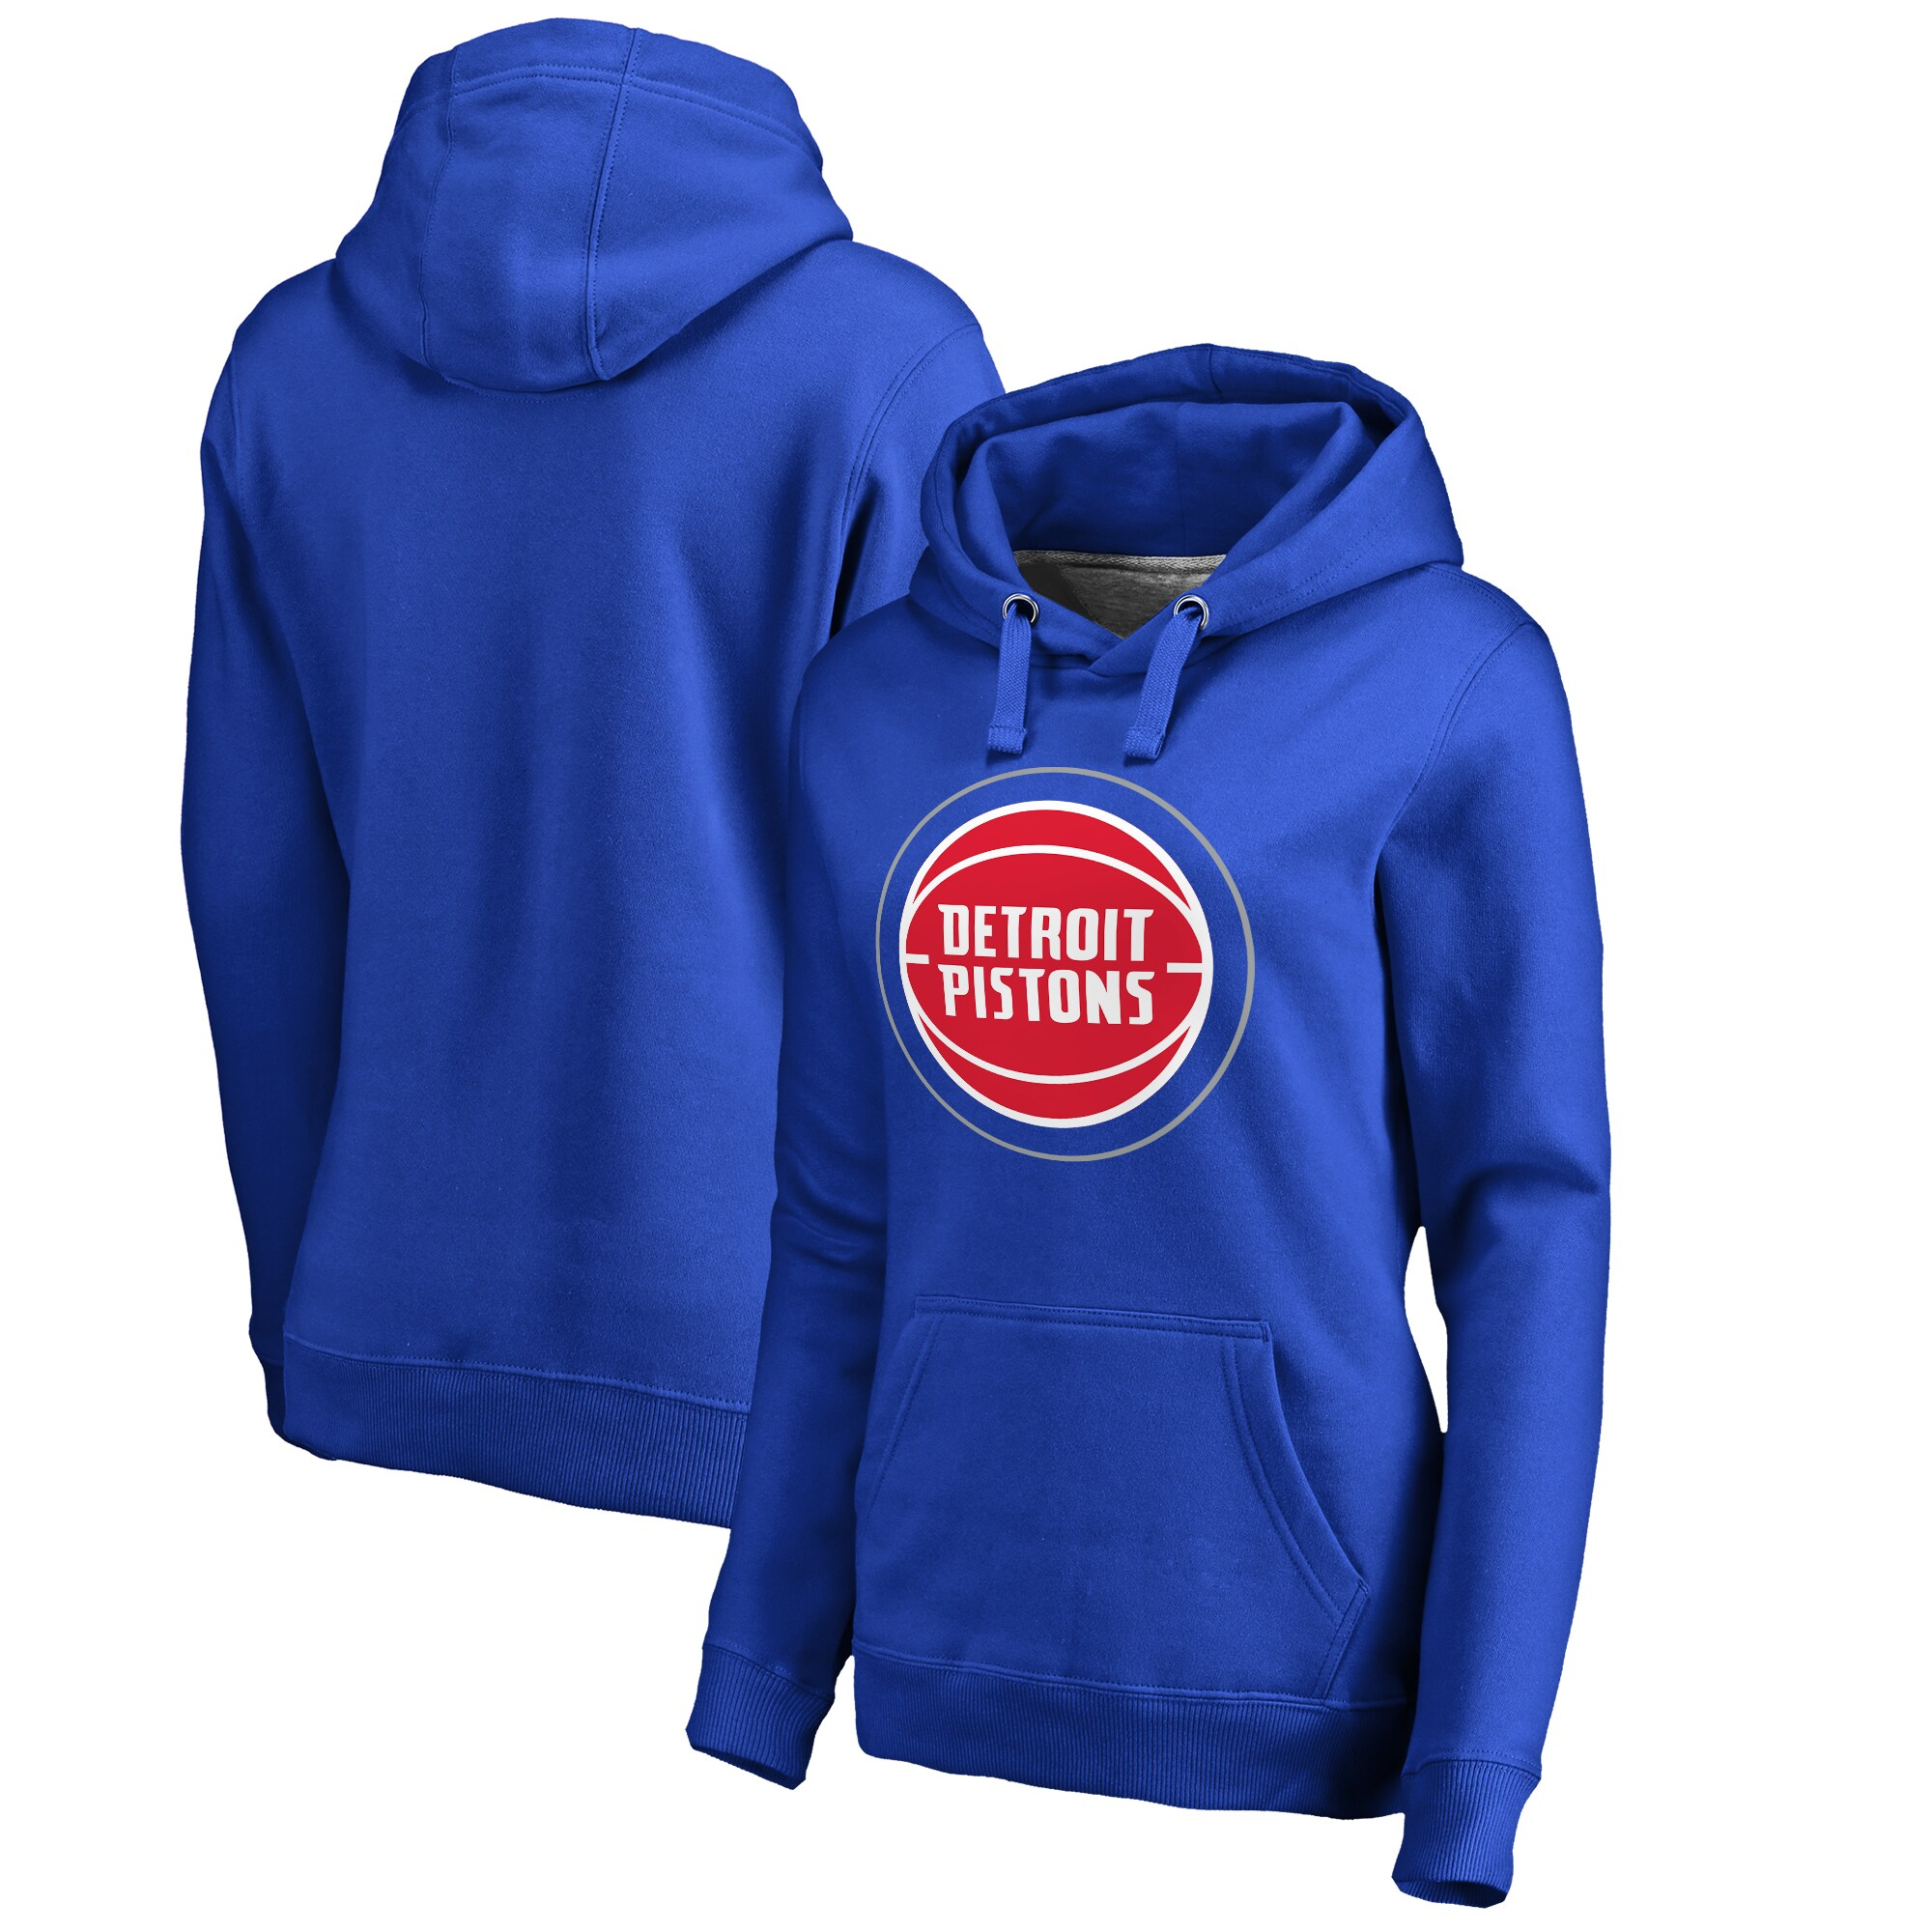 Detroit Pistons Fanatics Branded Women's Primary Logo Pullover Hoodie - Blue